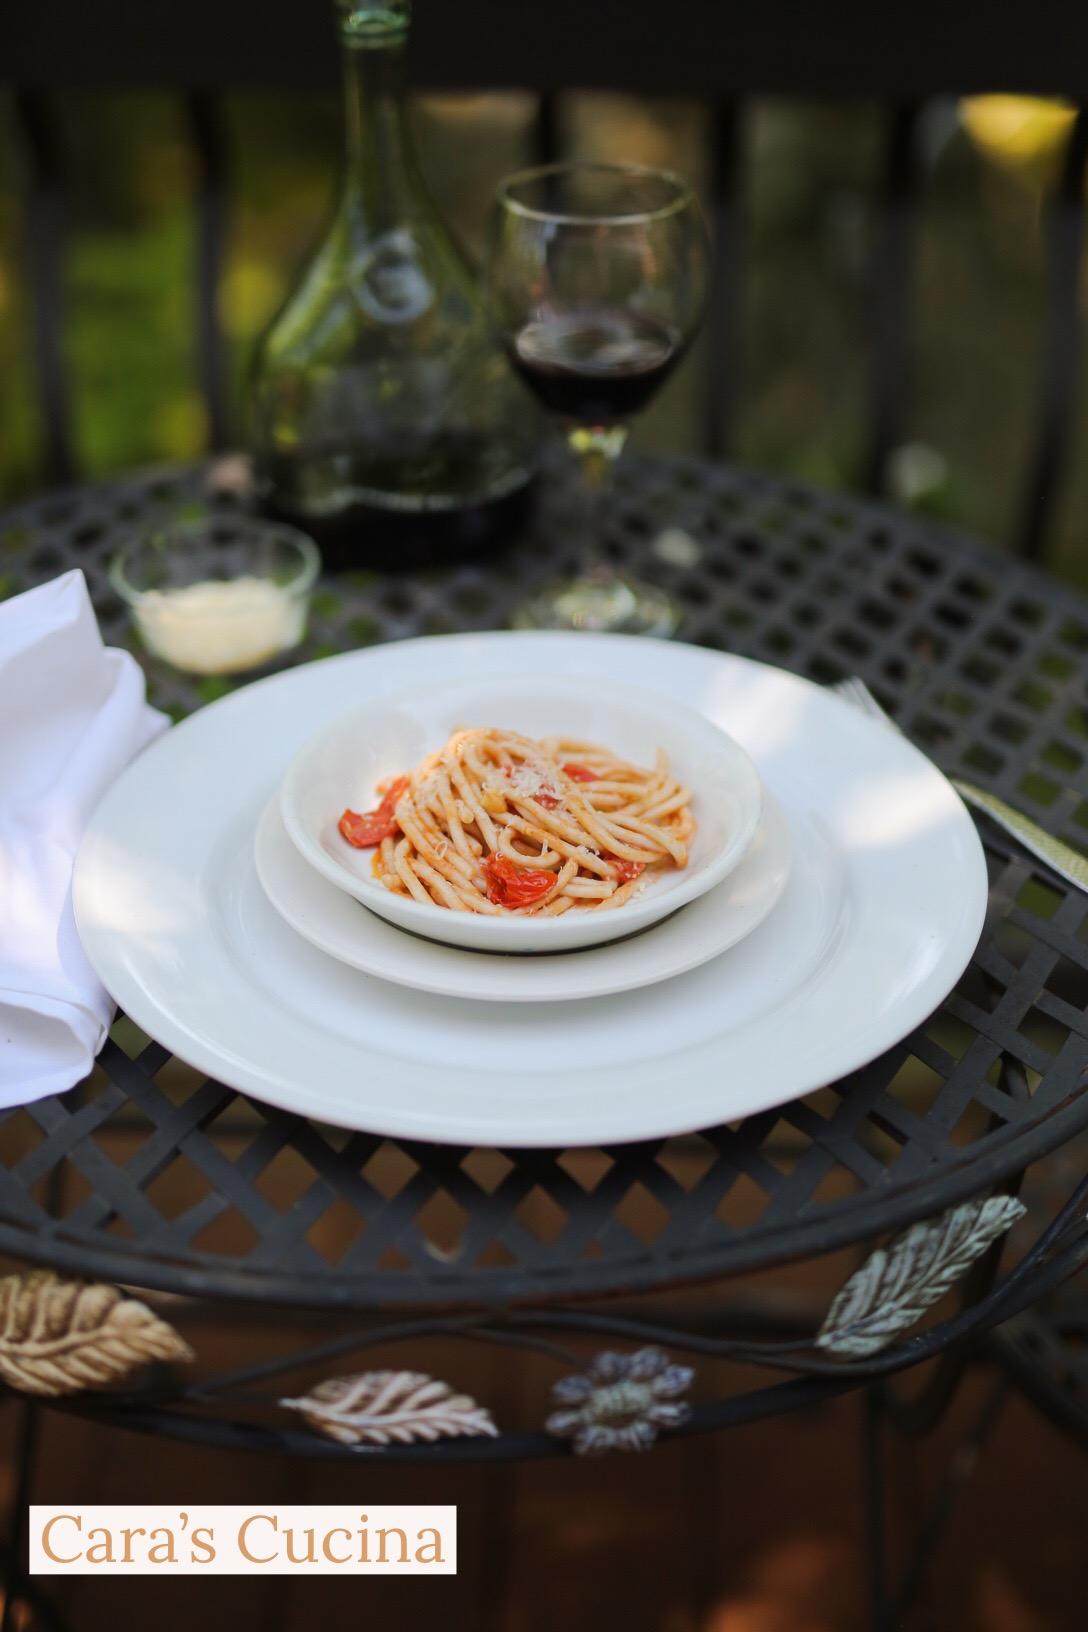 Cara's Cucina: Cherry Tomato Sauce